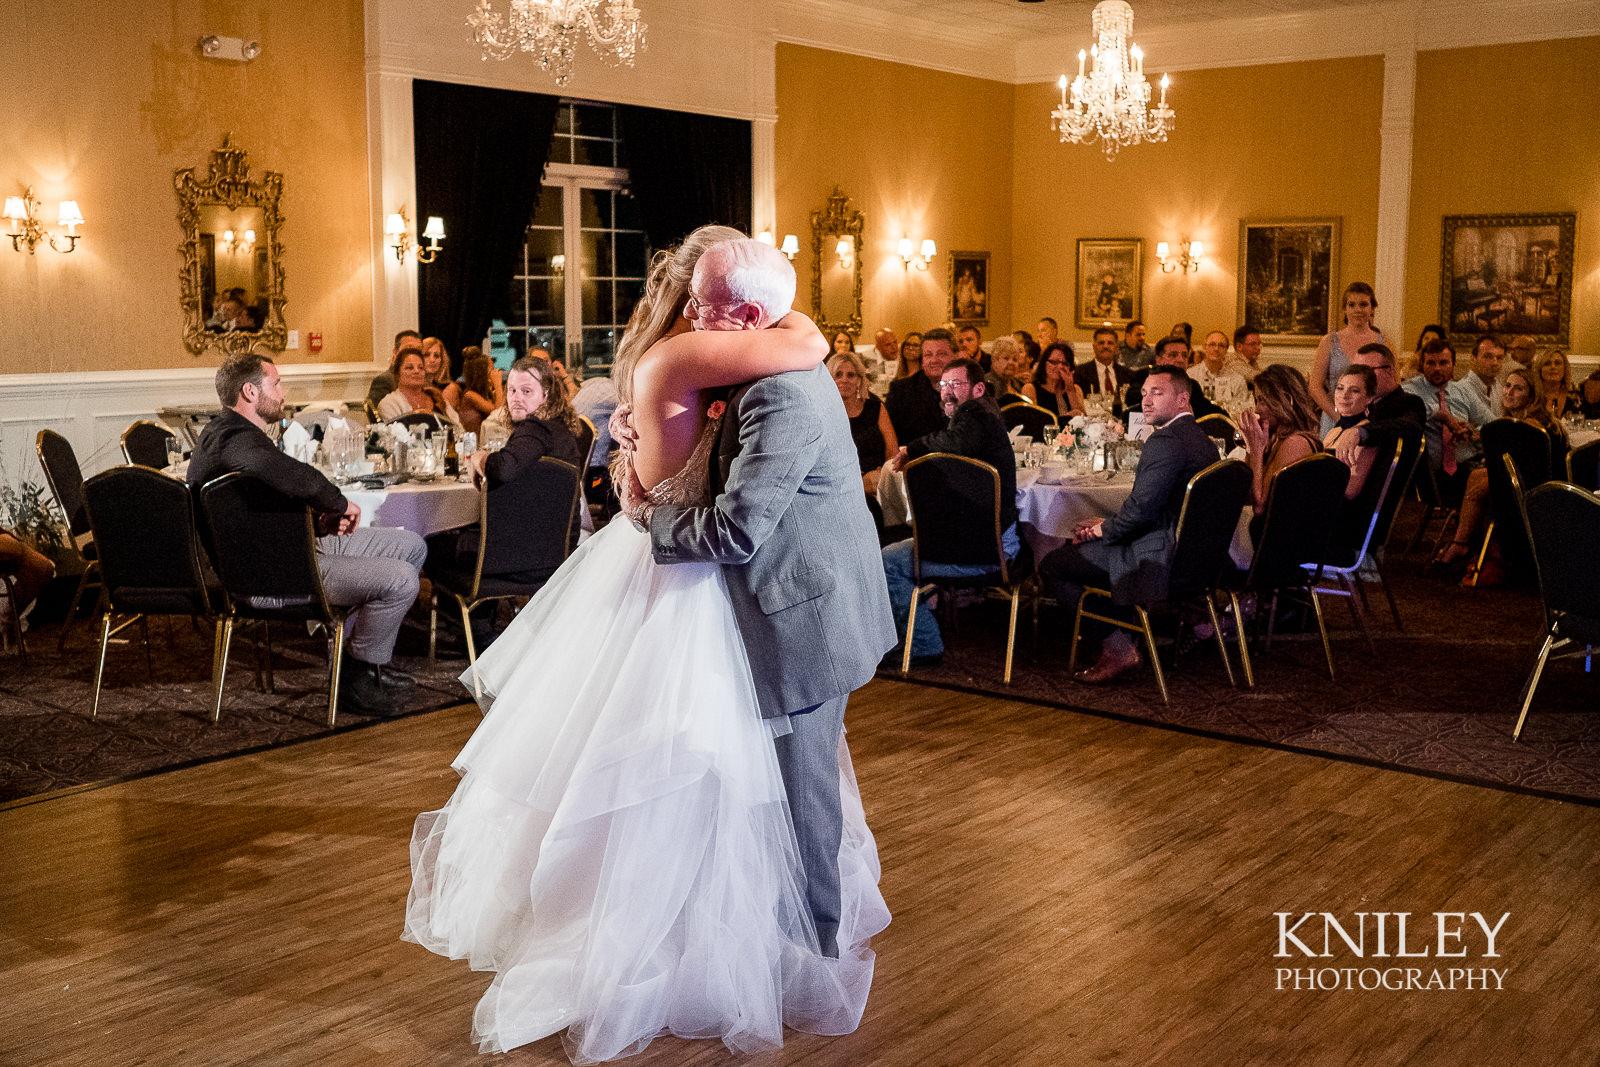 108 - Buffalo NY wedding pictures - Sean Patrick Restaurant Wedding Reception - Getzville - XT2B9578.jpg